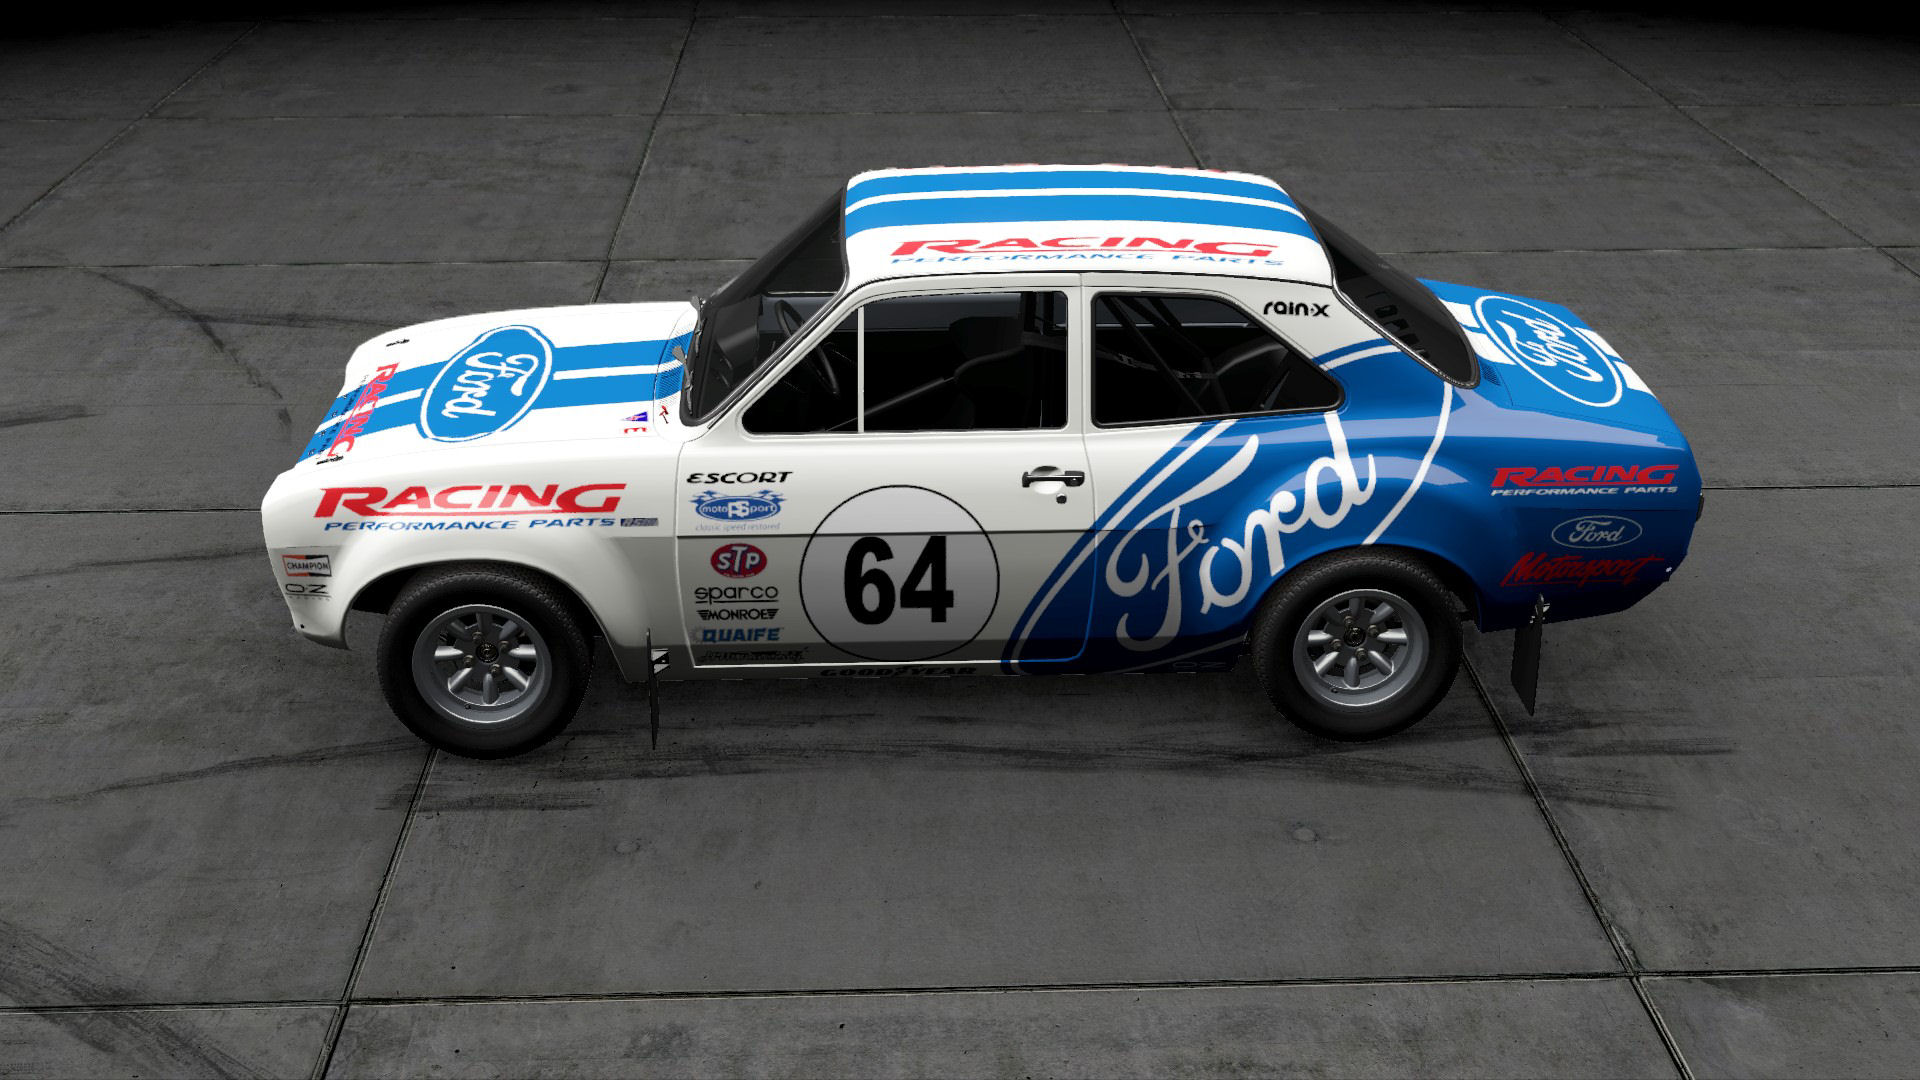 Ford Escort mk1 rx Racing Performance Parts 02.jpg